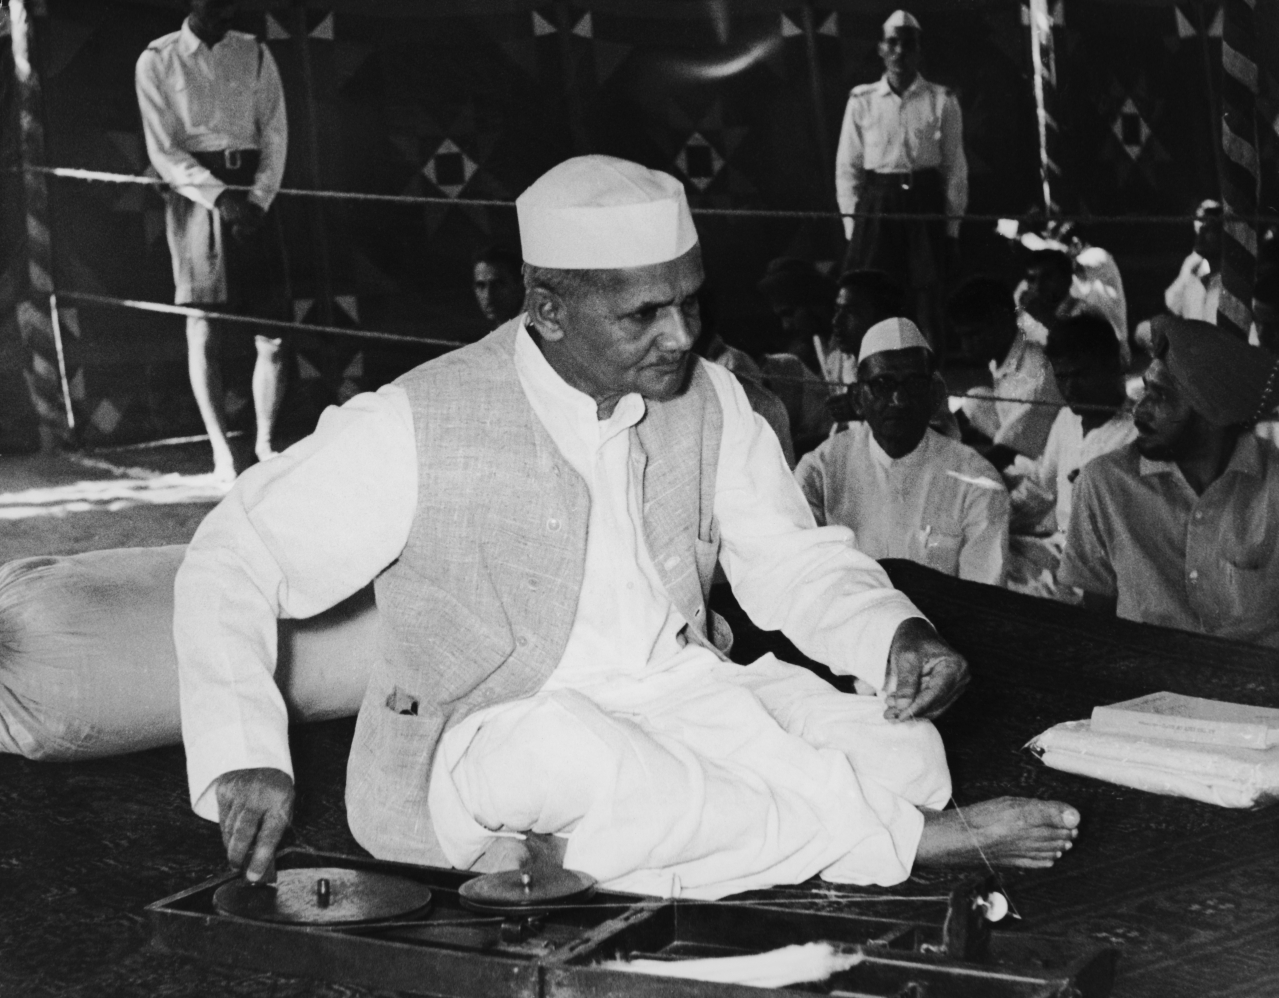 Lal Bahadur Shastri (Keystone/Hulton Archive/Getty Images)